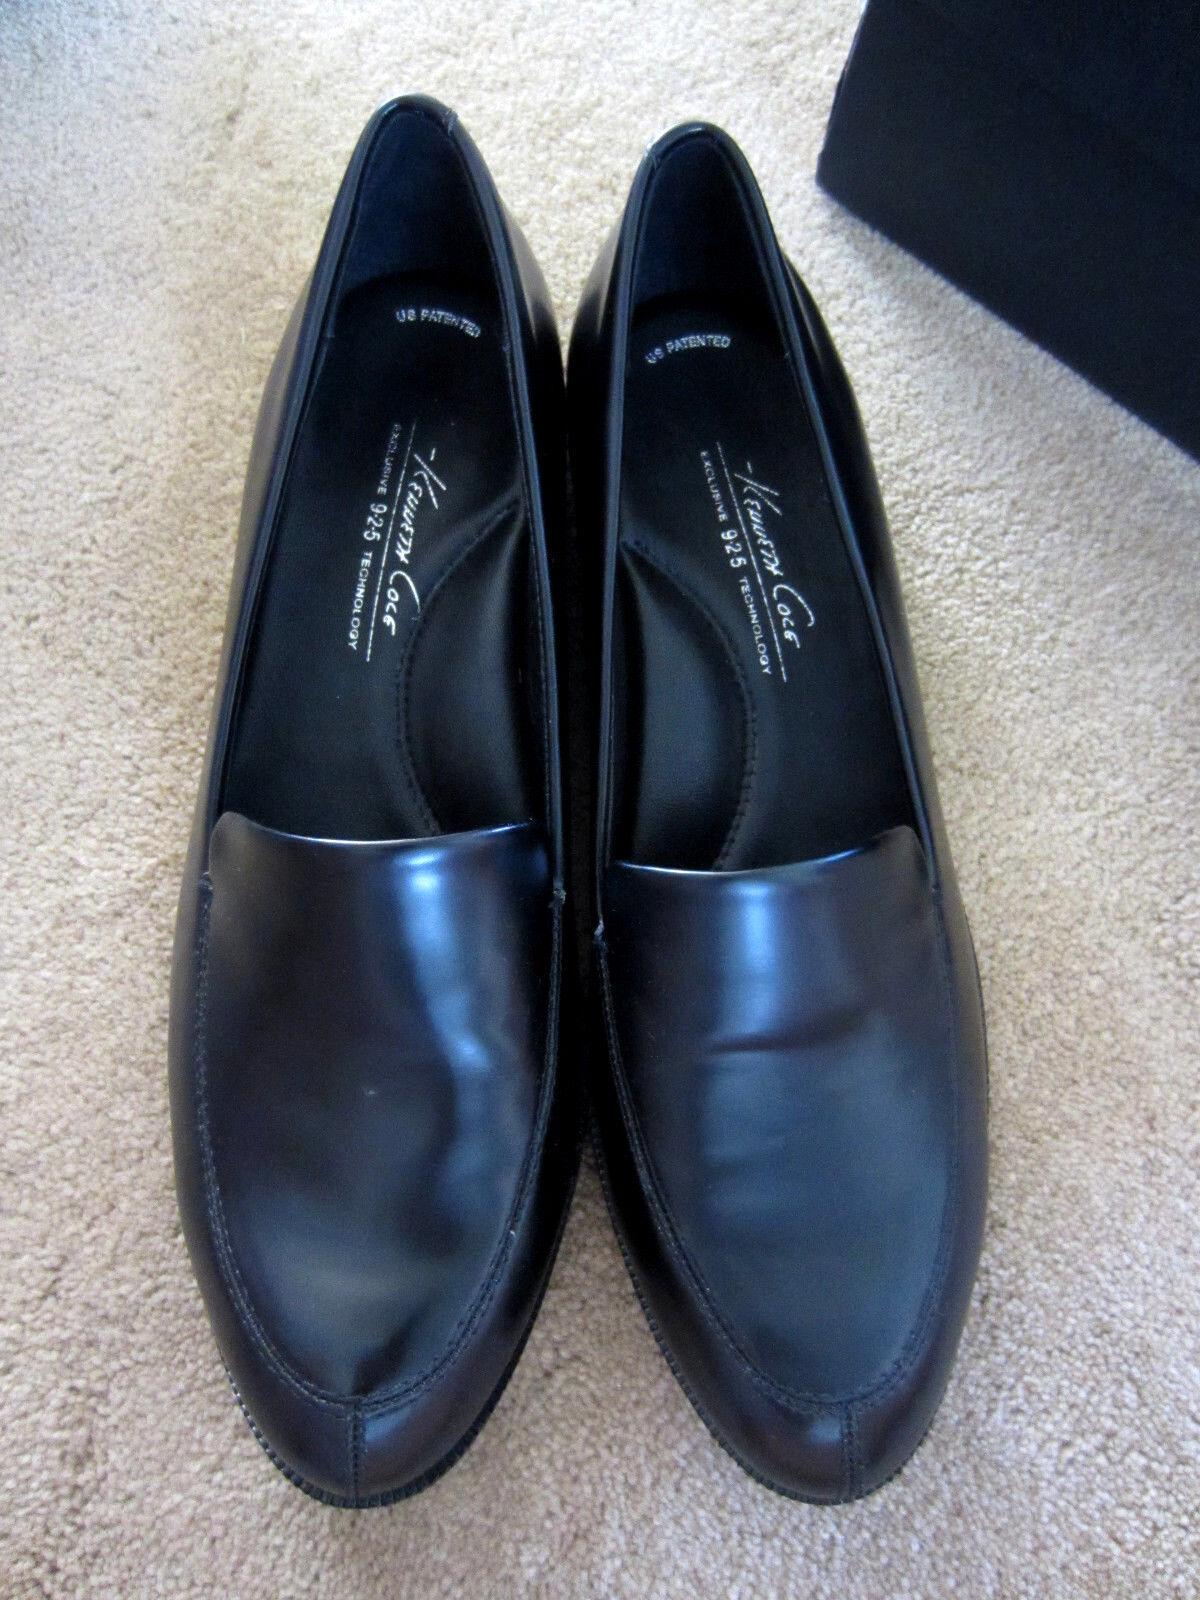 Kenneth Cole Damenschuhe Hudson CA Slip On Top Grain Leder Loafer Schuhes 120 NIB